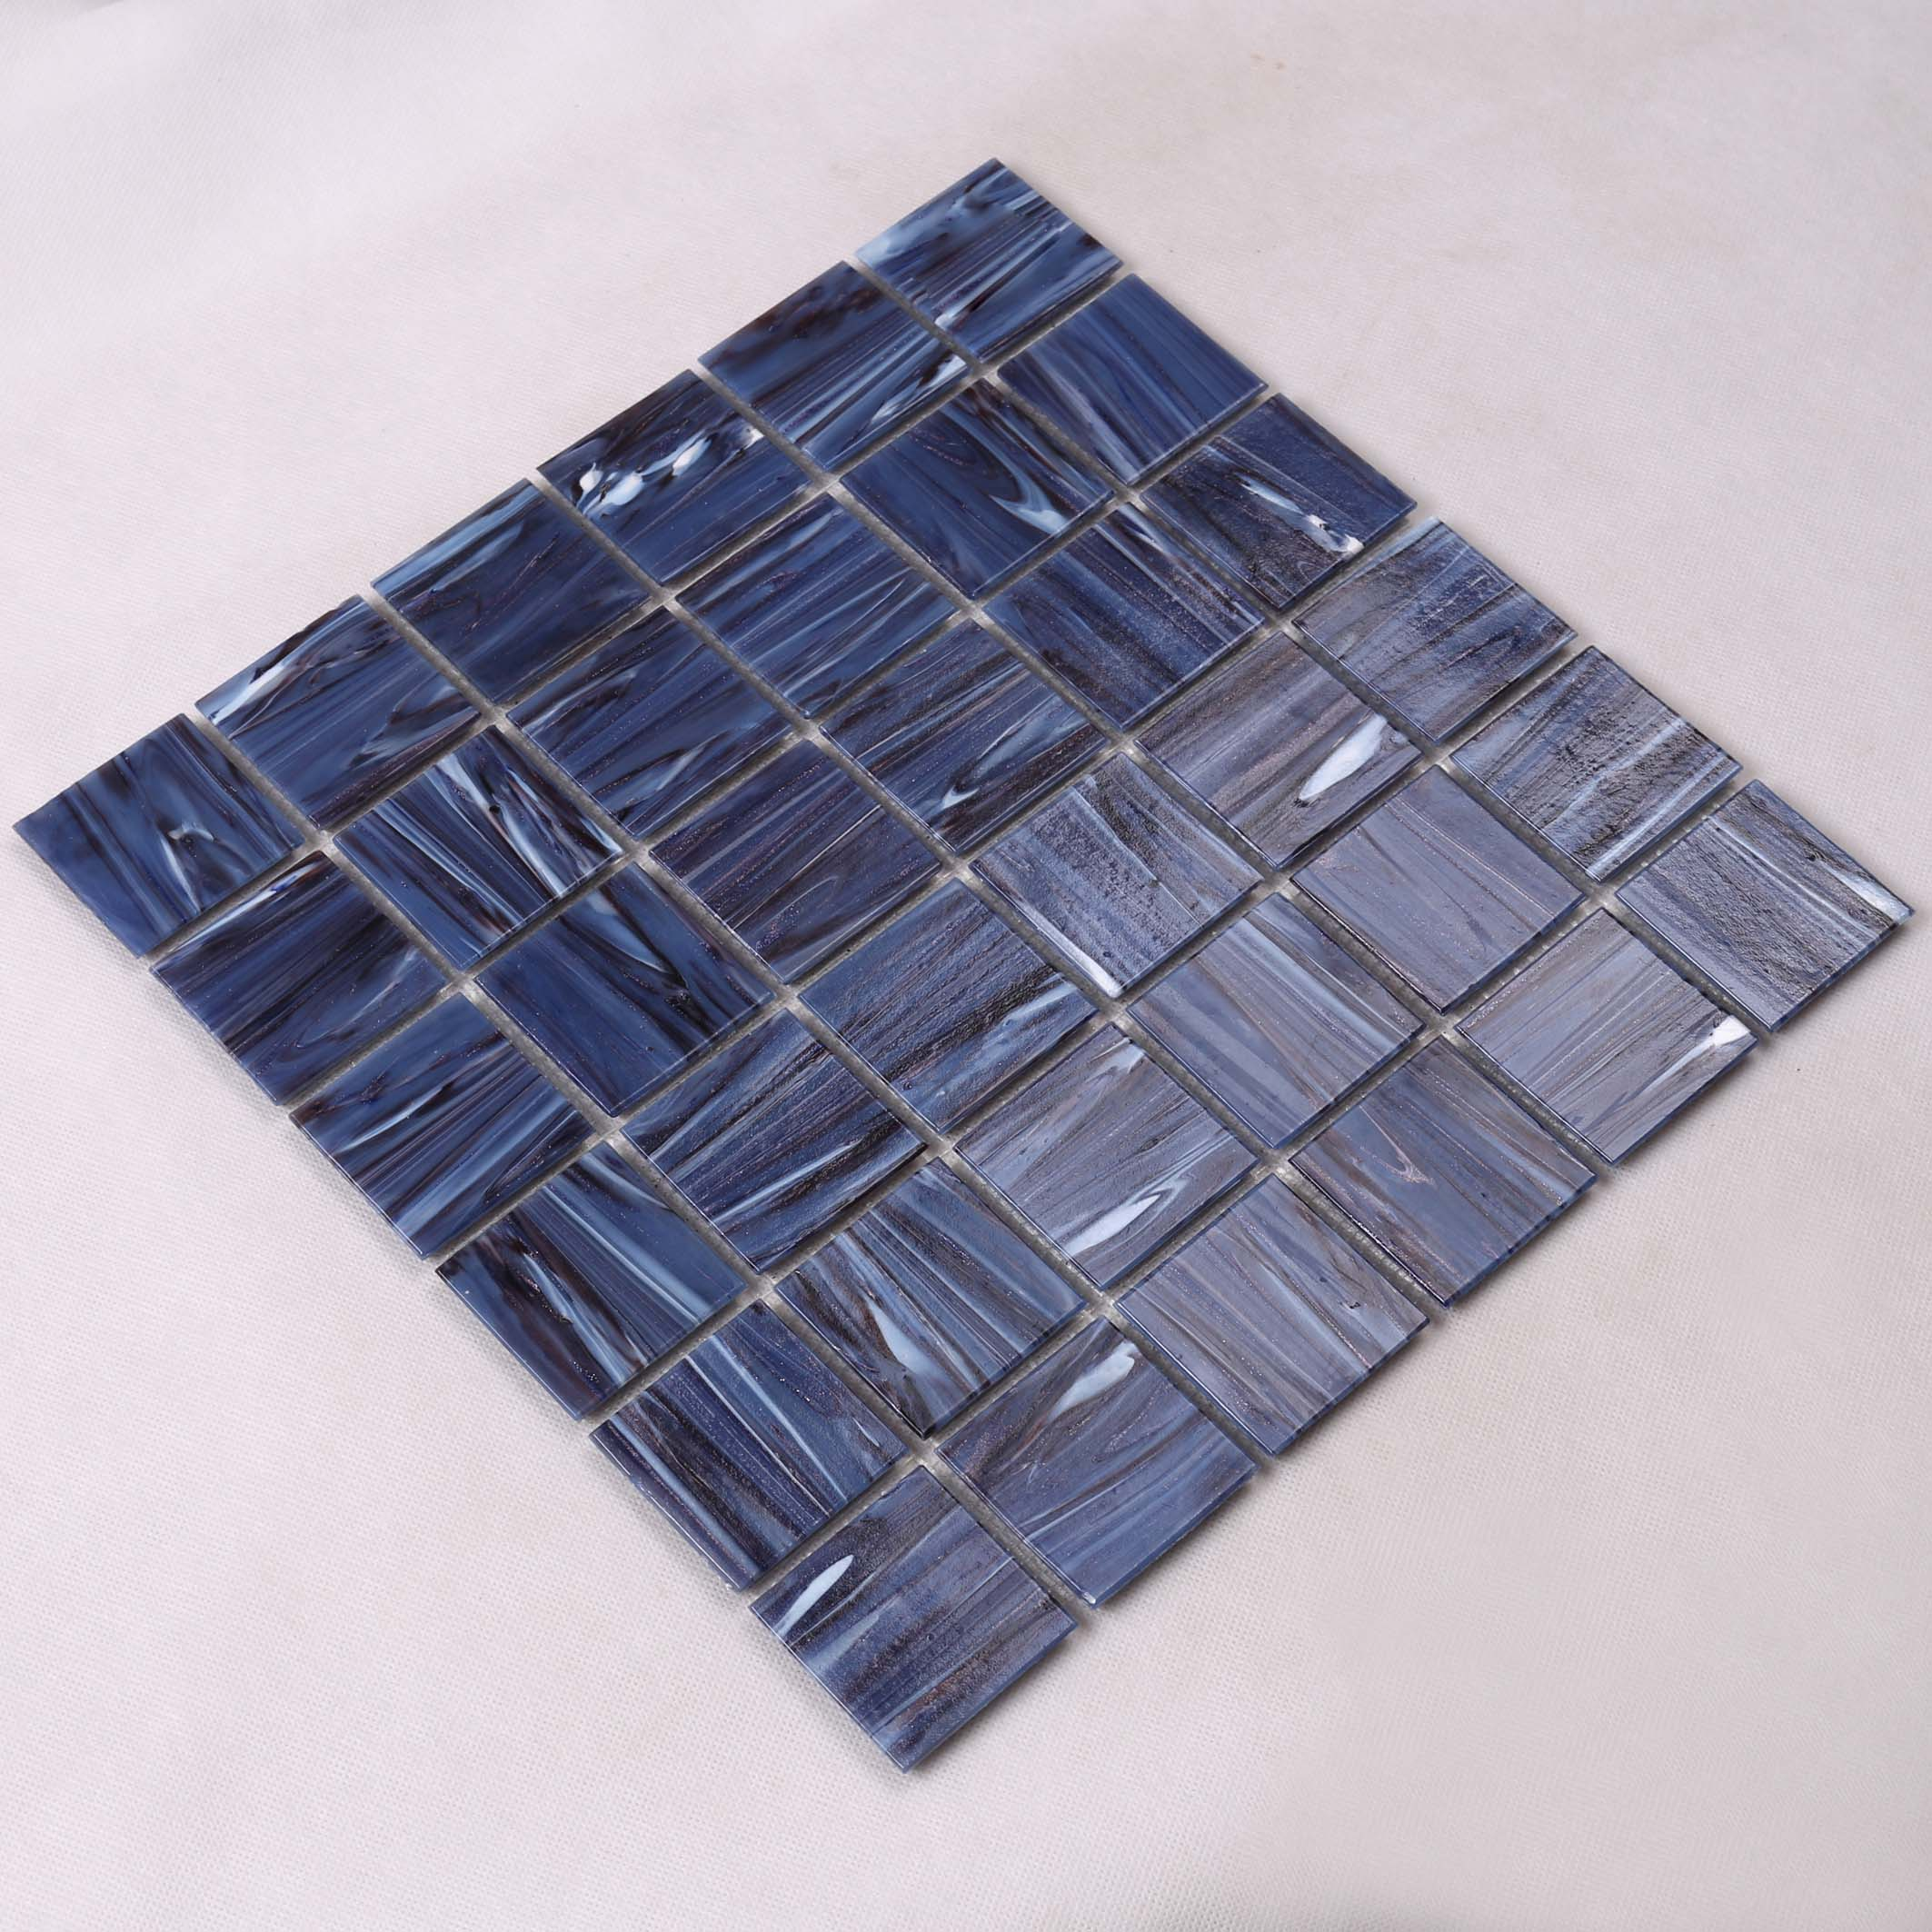 Heng Xing-Oem Swimming Pool Tiles Manufacturer, Pool Tile Suppliers-2